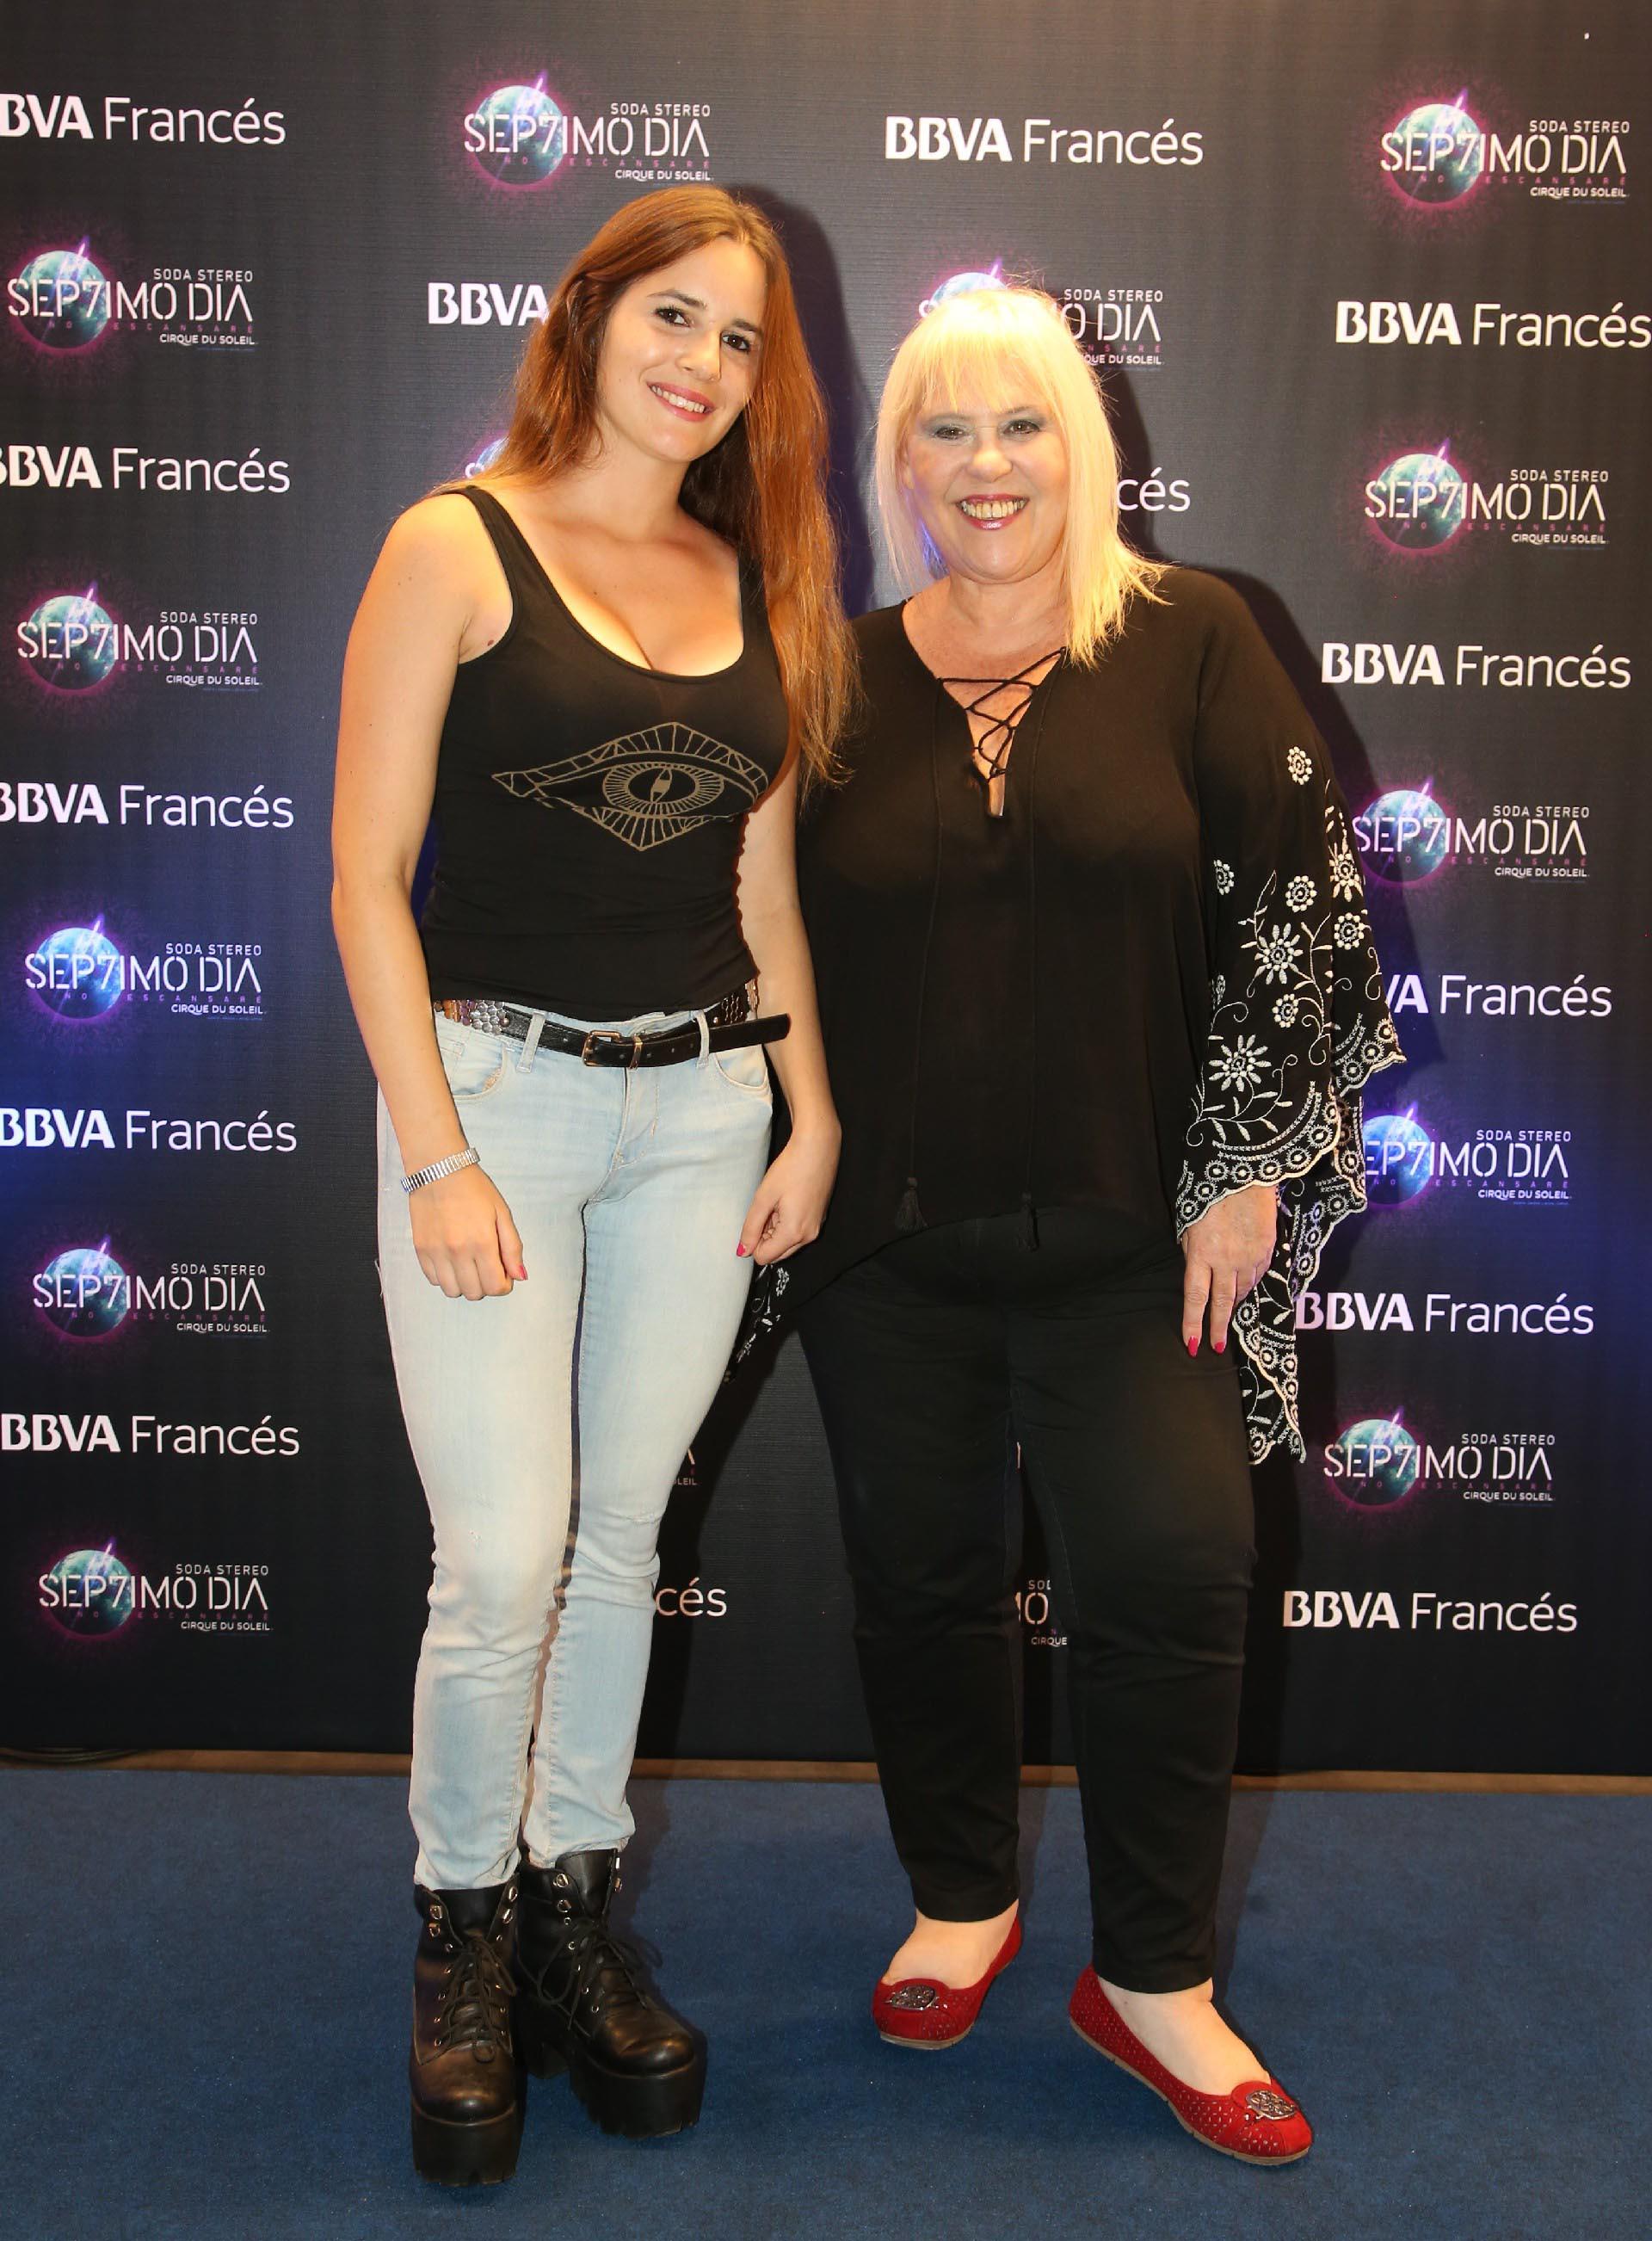 Laura Ubfal y su hija Alma Gandini